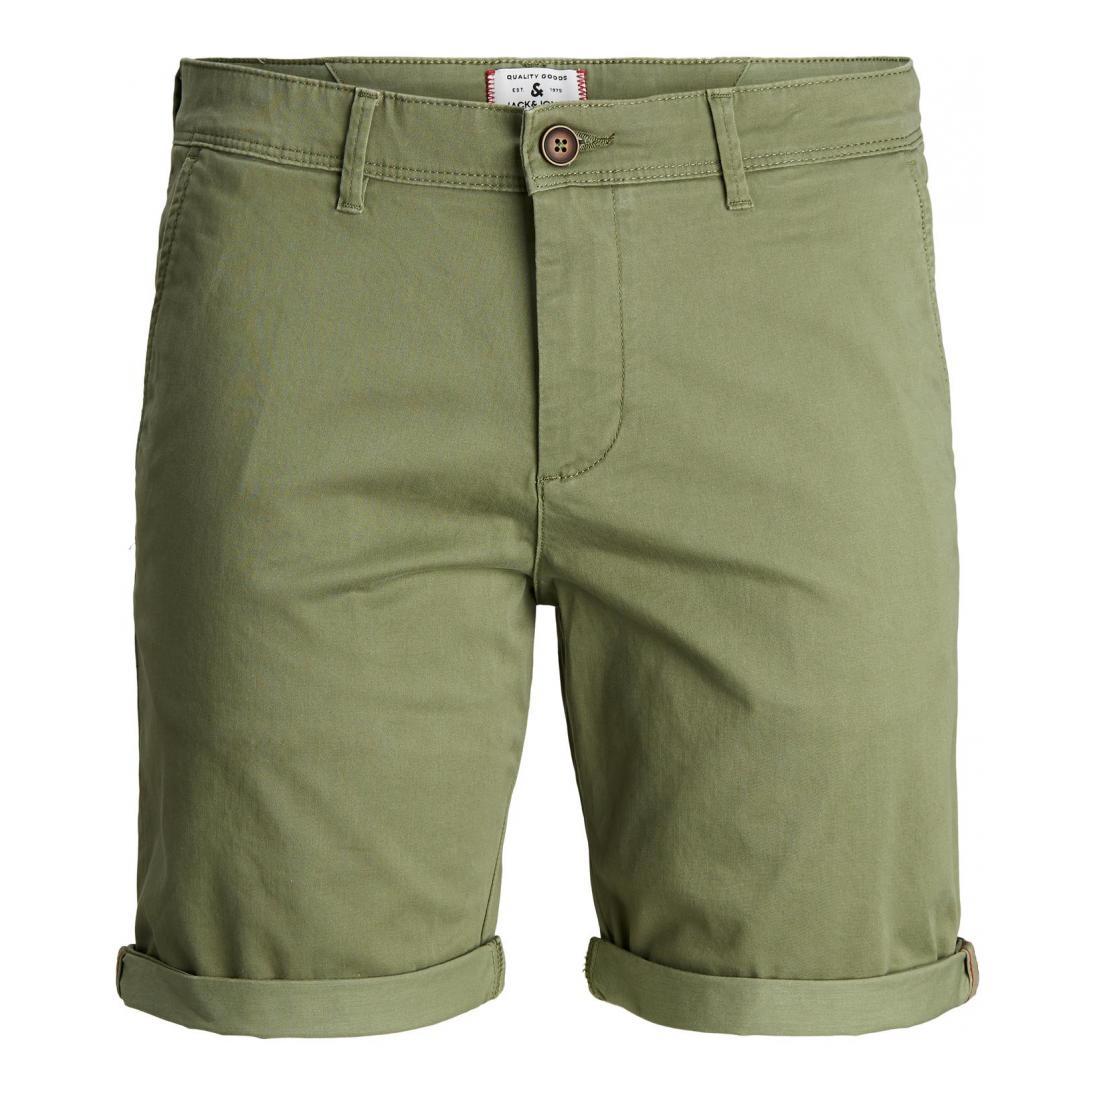 Jack & Jones Bermuda/Shorts Herren JJIBOWIE JJSHORTS SOLID S